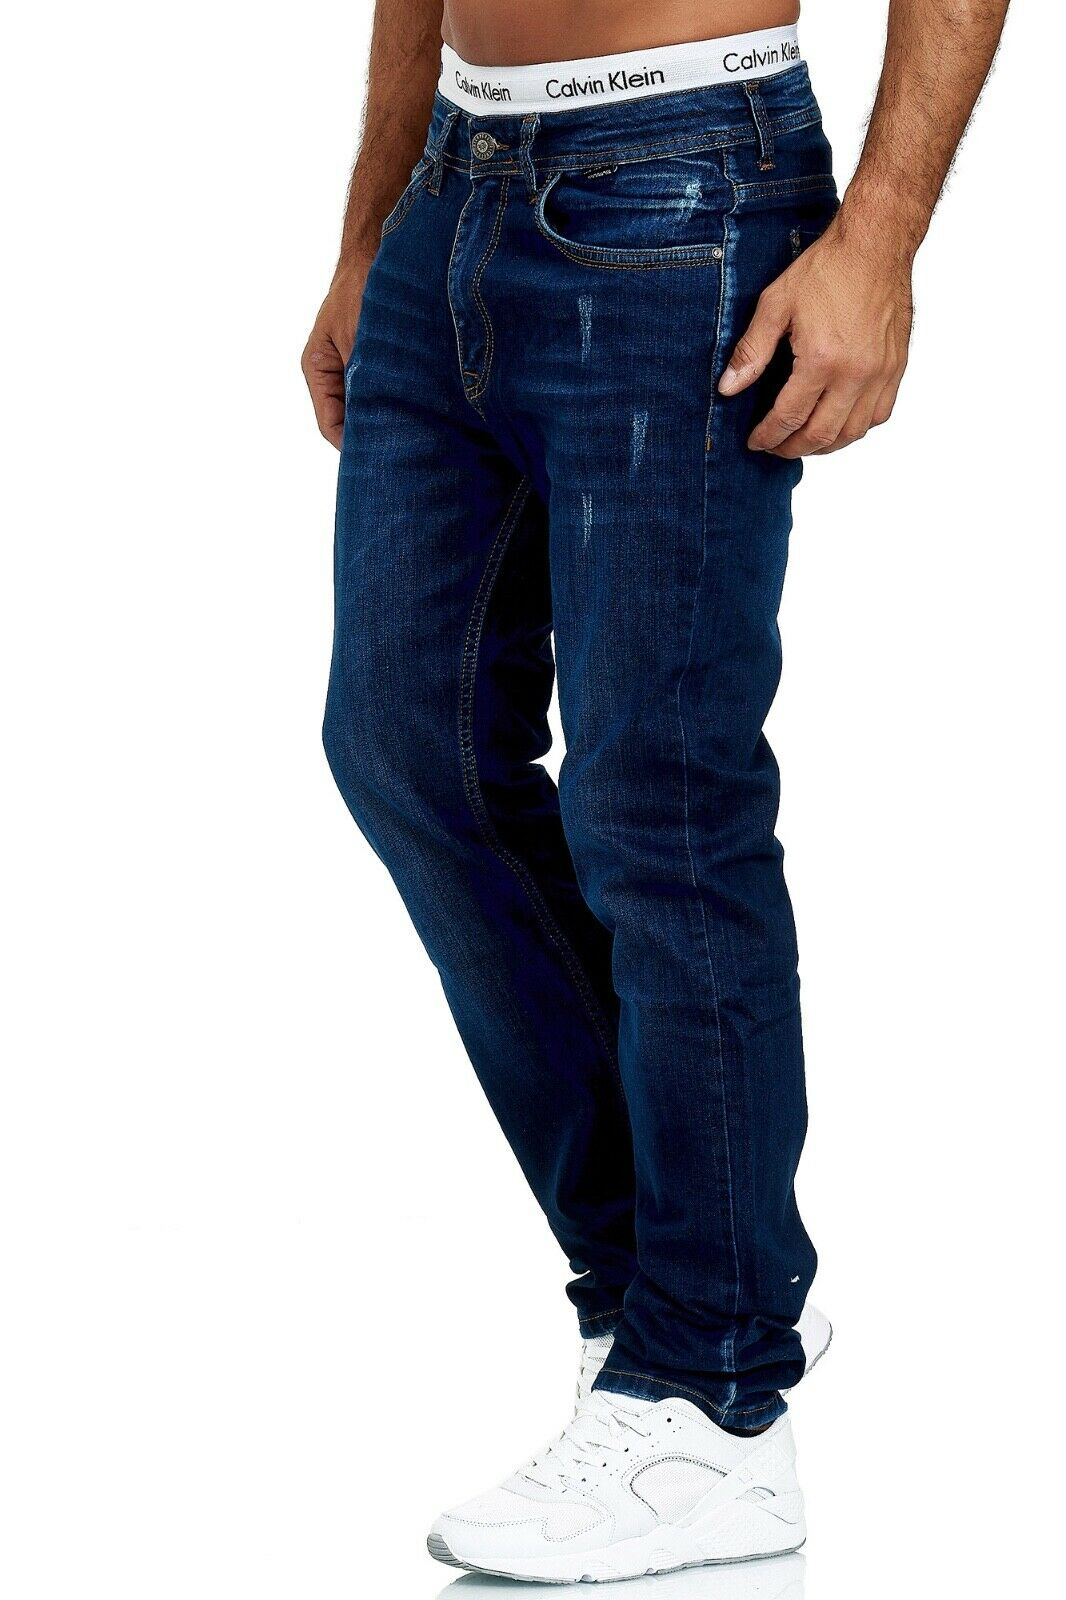 Herren-Jeans-Hose-Denim-KC-Black-Washed-Straight-Cut-Regular-Dicke-Naht-naehte Indexbild 67